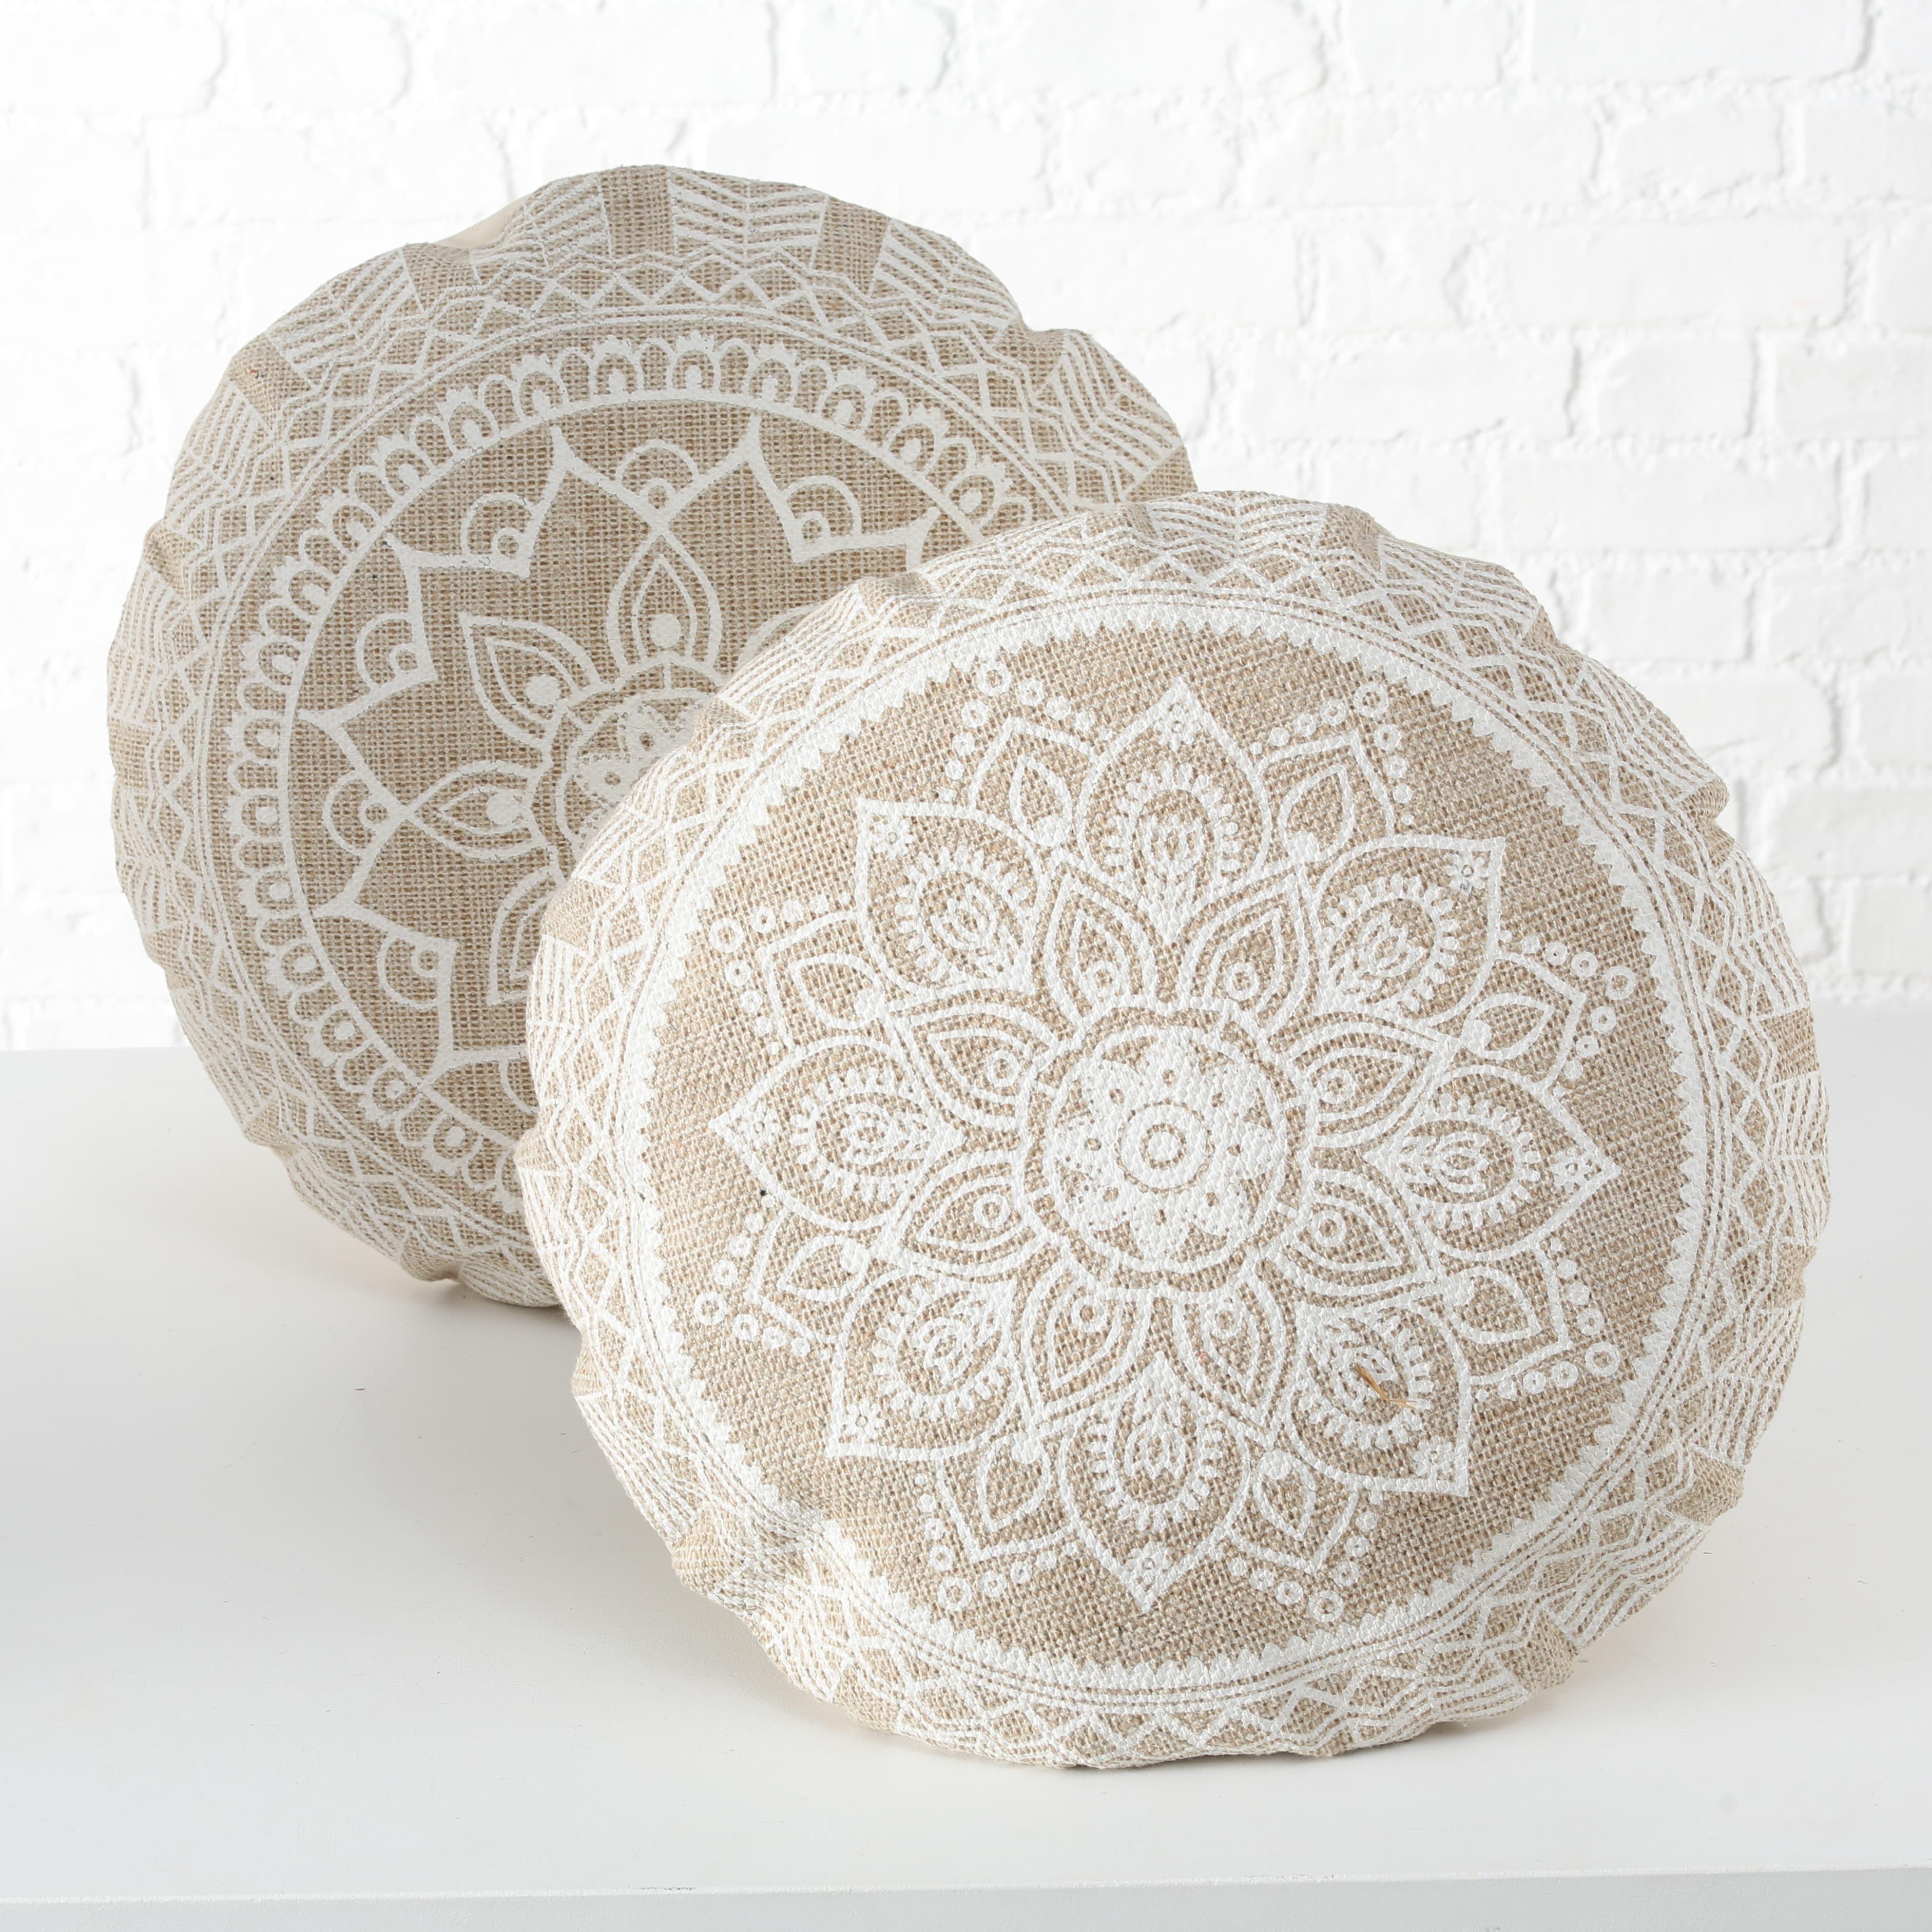 Perna de sezut decorativa din bumbac Mandala Bej / Alb, Modele Asortate, Ø56xH4 cm imagine